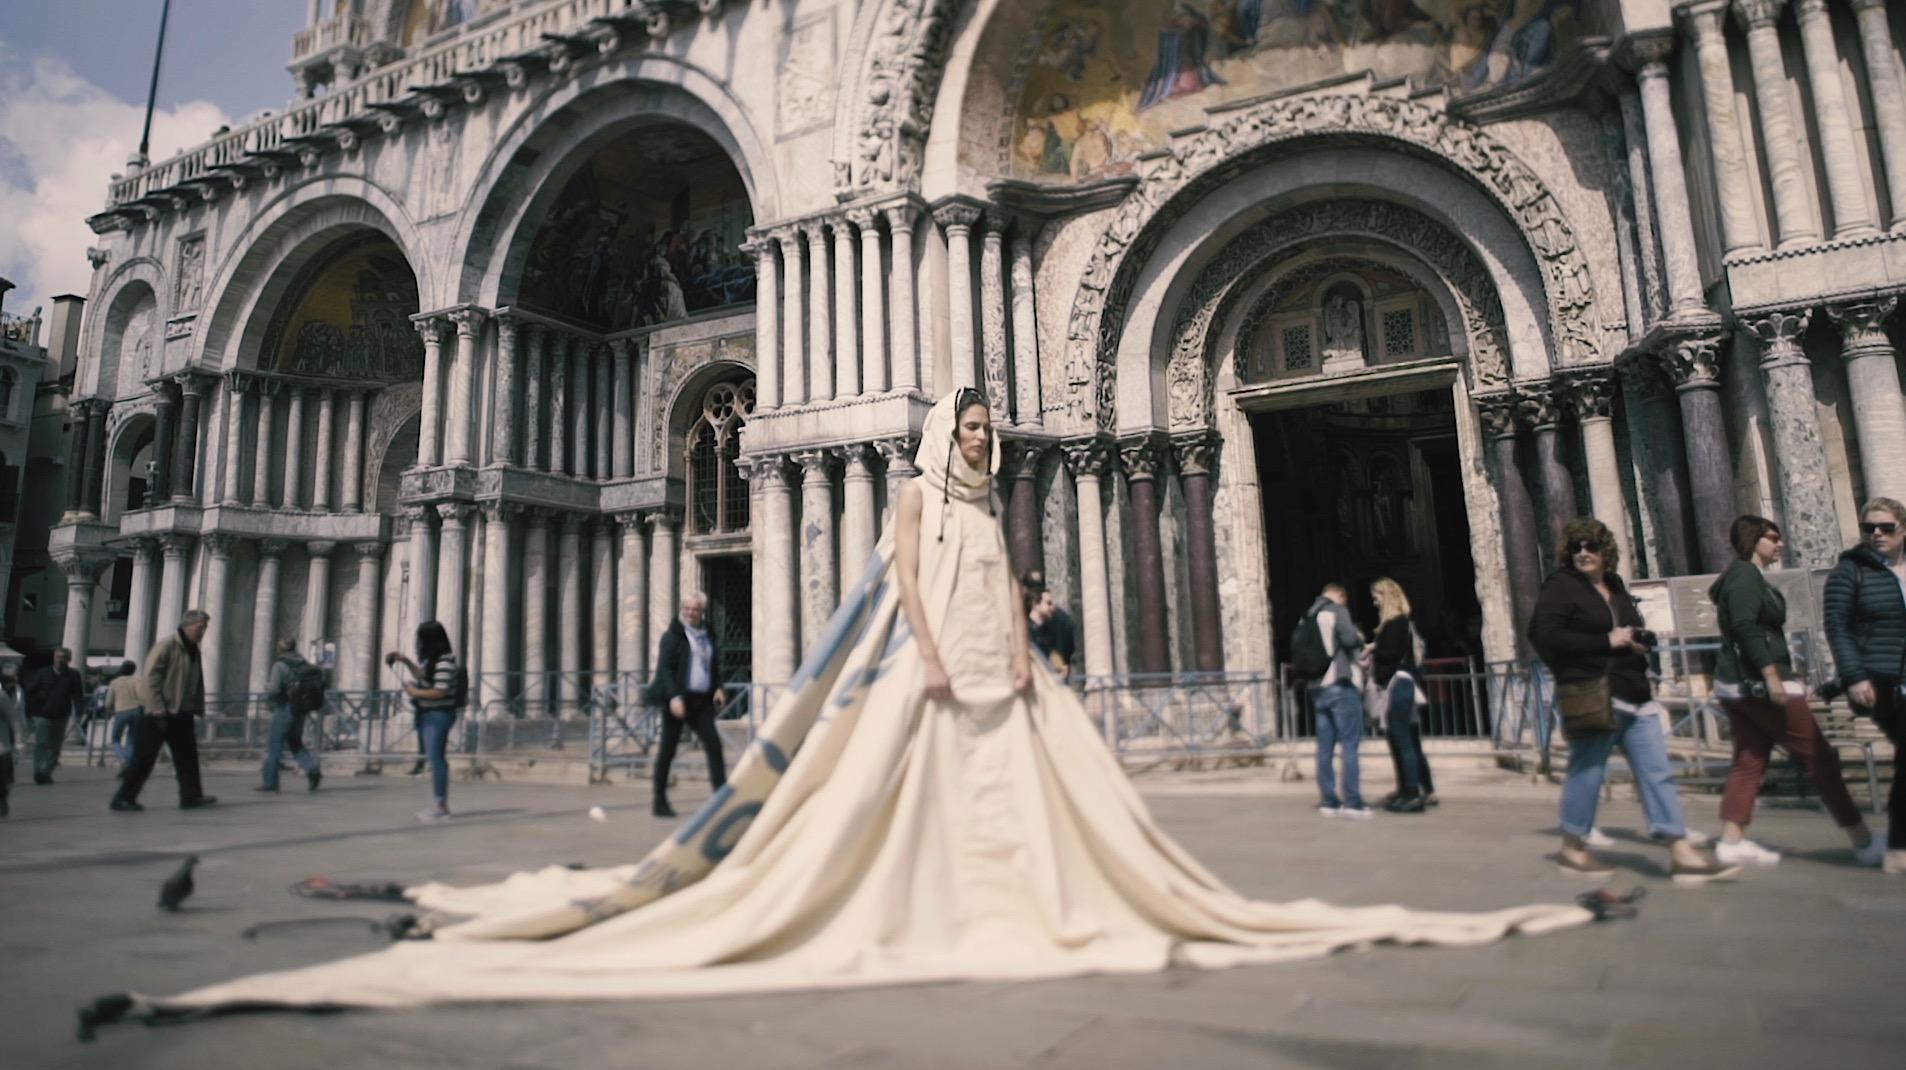 citozenb_dress_venice2.10.jpg